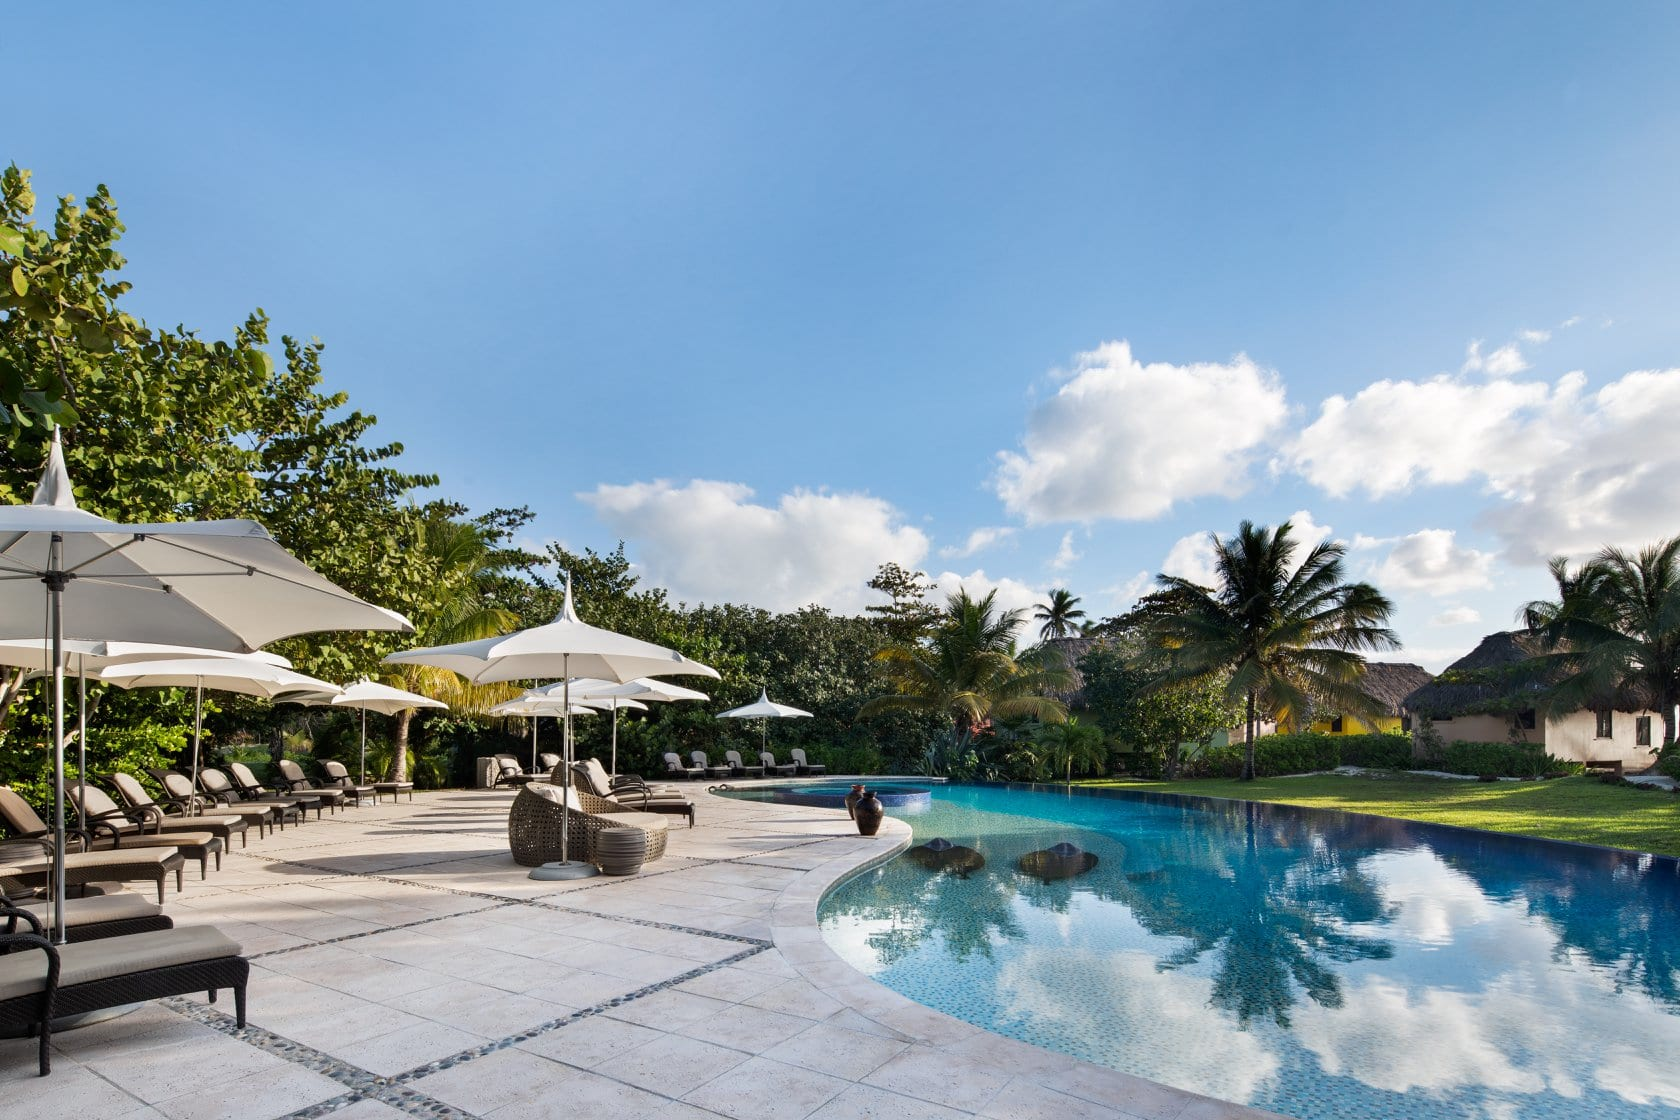 matachica-resort-belize-san-pedro-pool